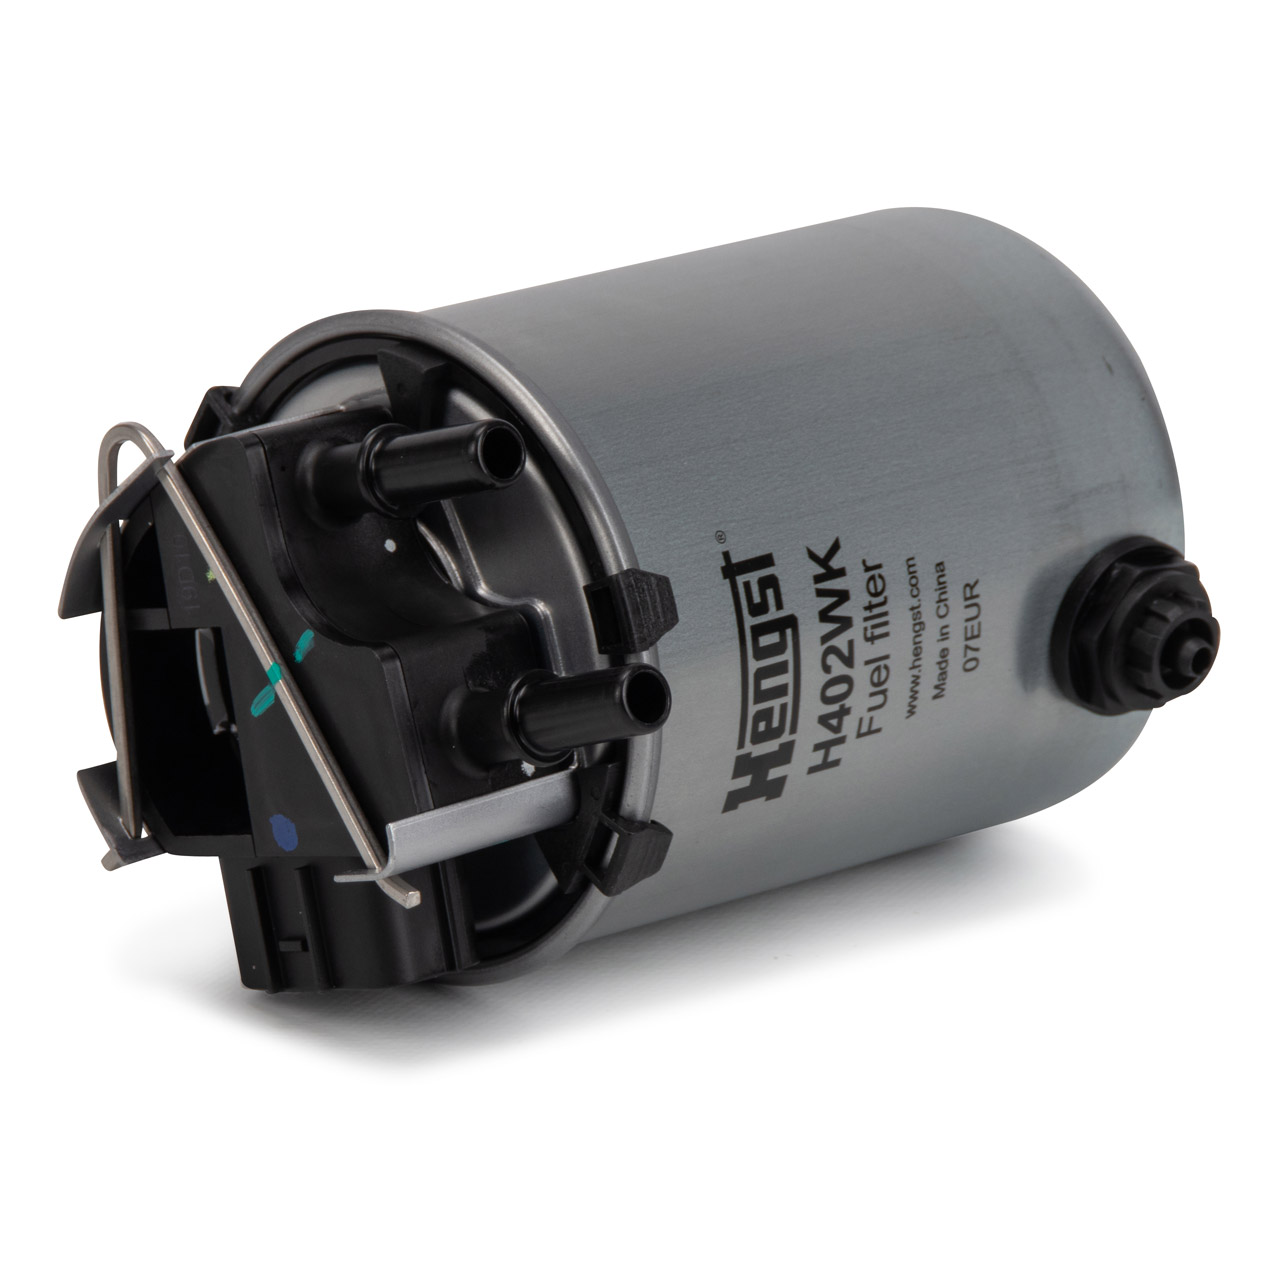 HENGST H402WK Kraftstofffilter Diesel NISSAN Qashqai I J10 1.6 dCi 130 PS